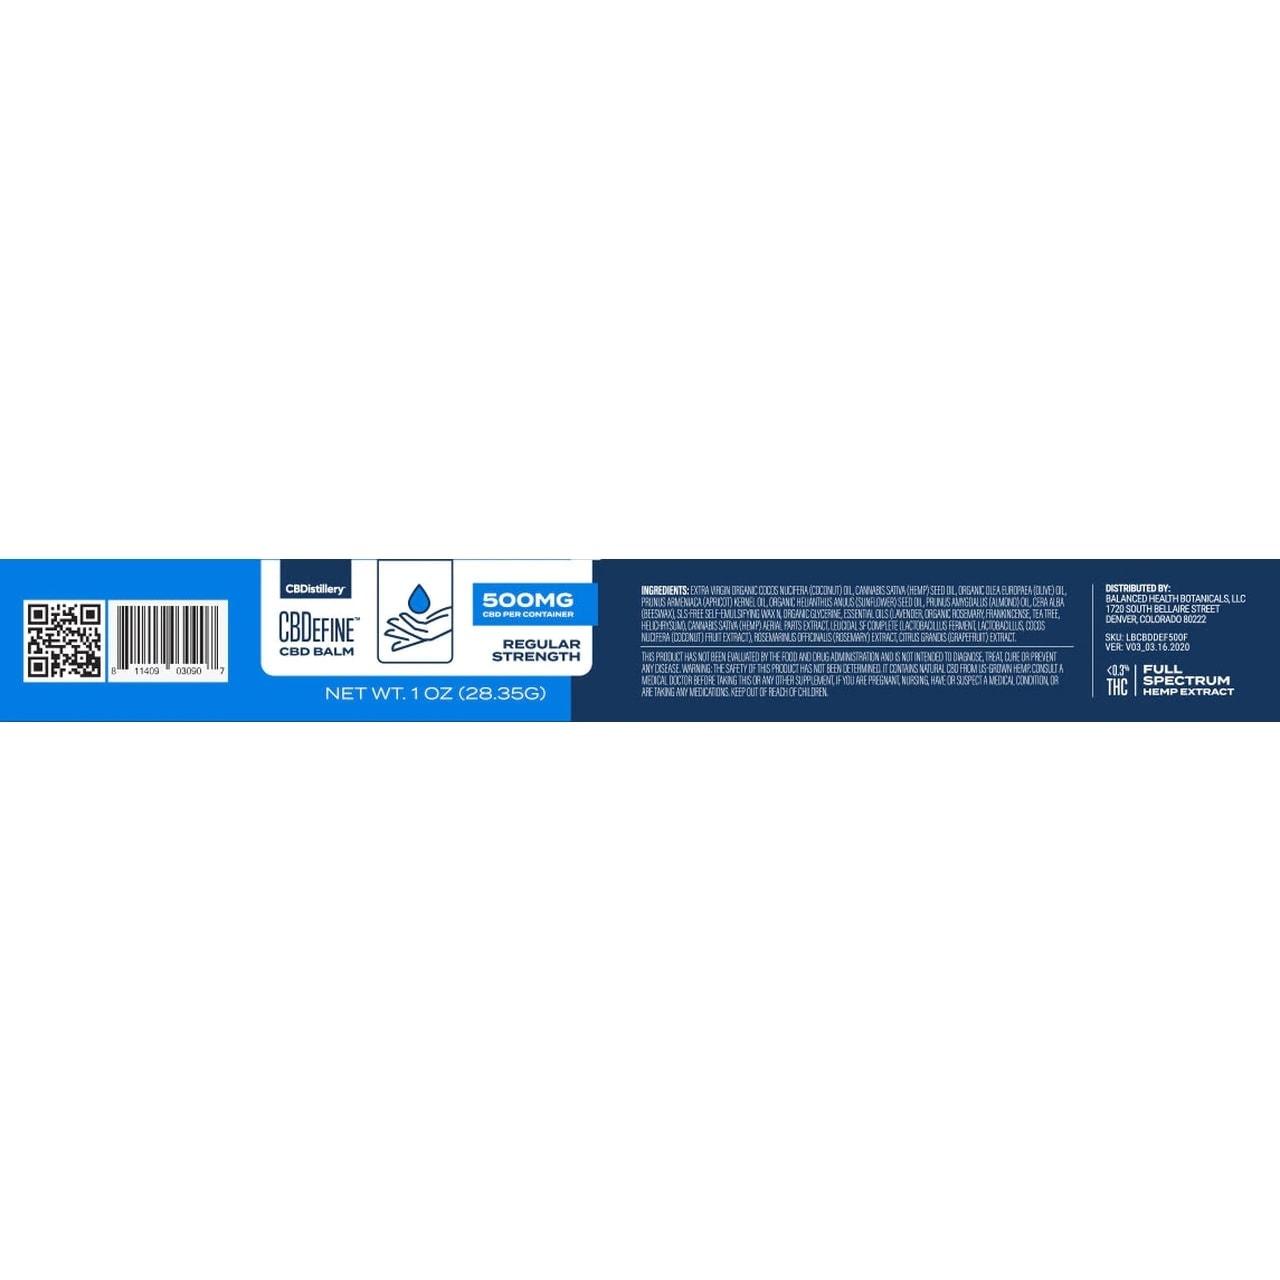 CBDistillery, CBDefine Skin Care Cream, Full Spectrum, 500mg of CBD2